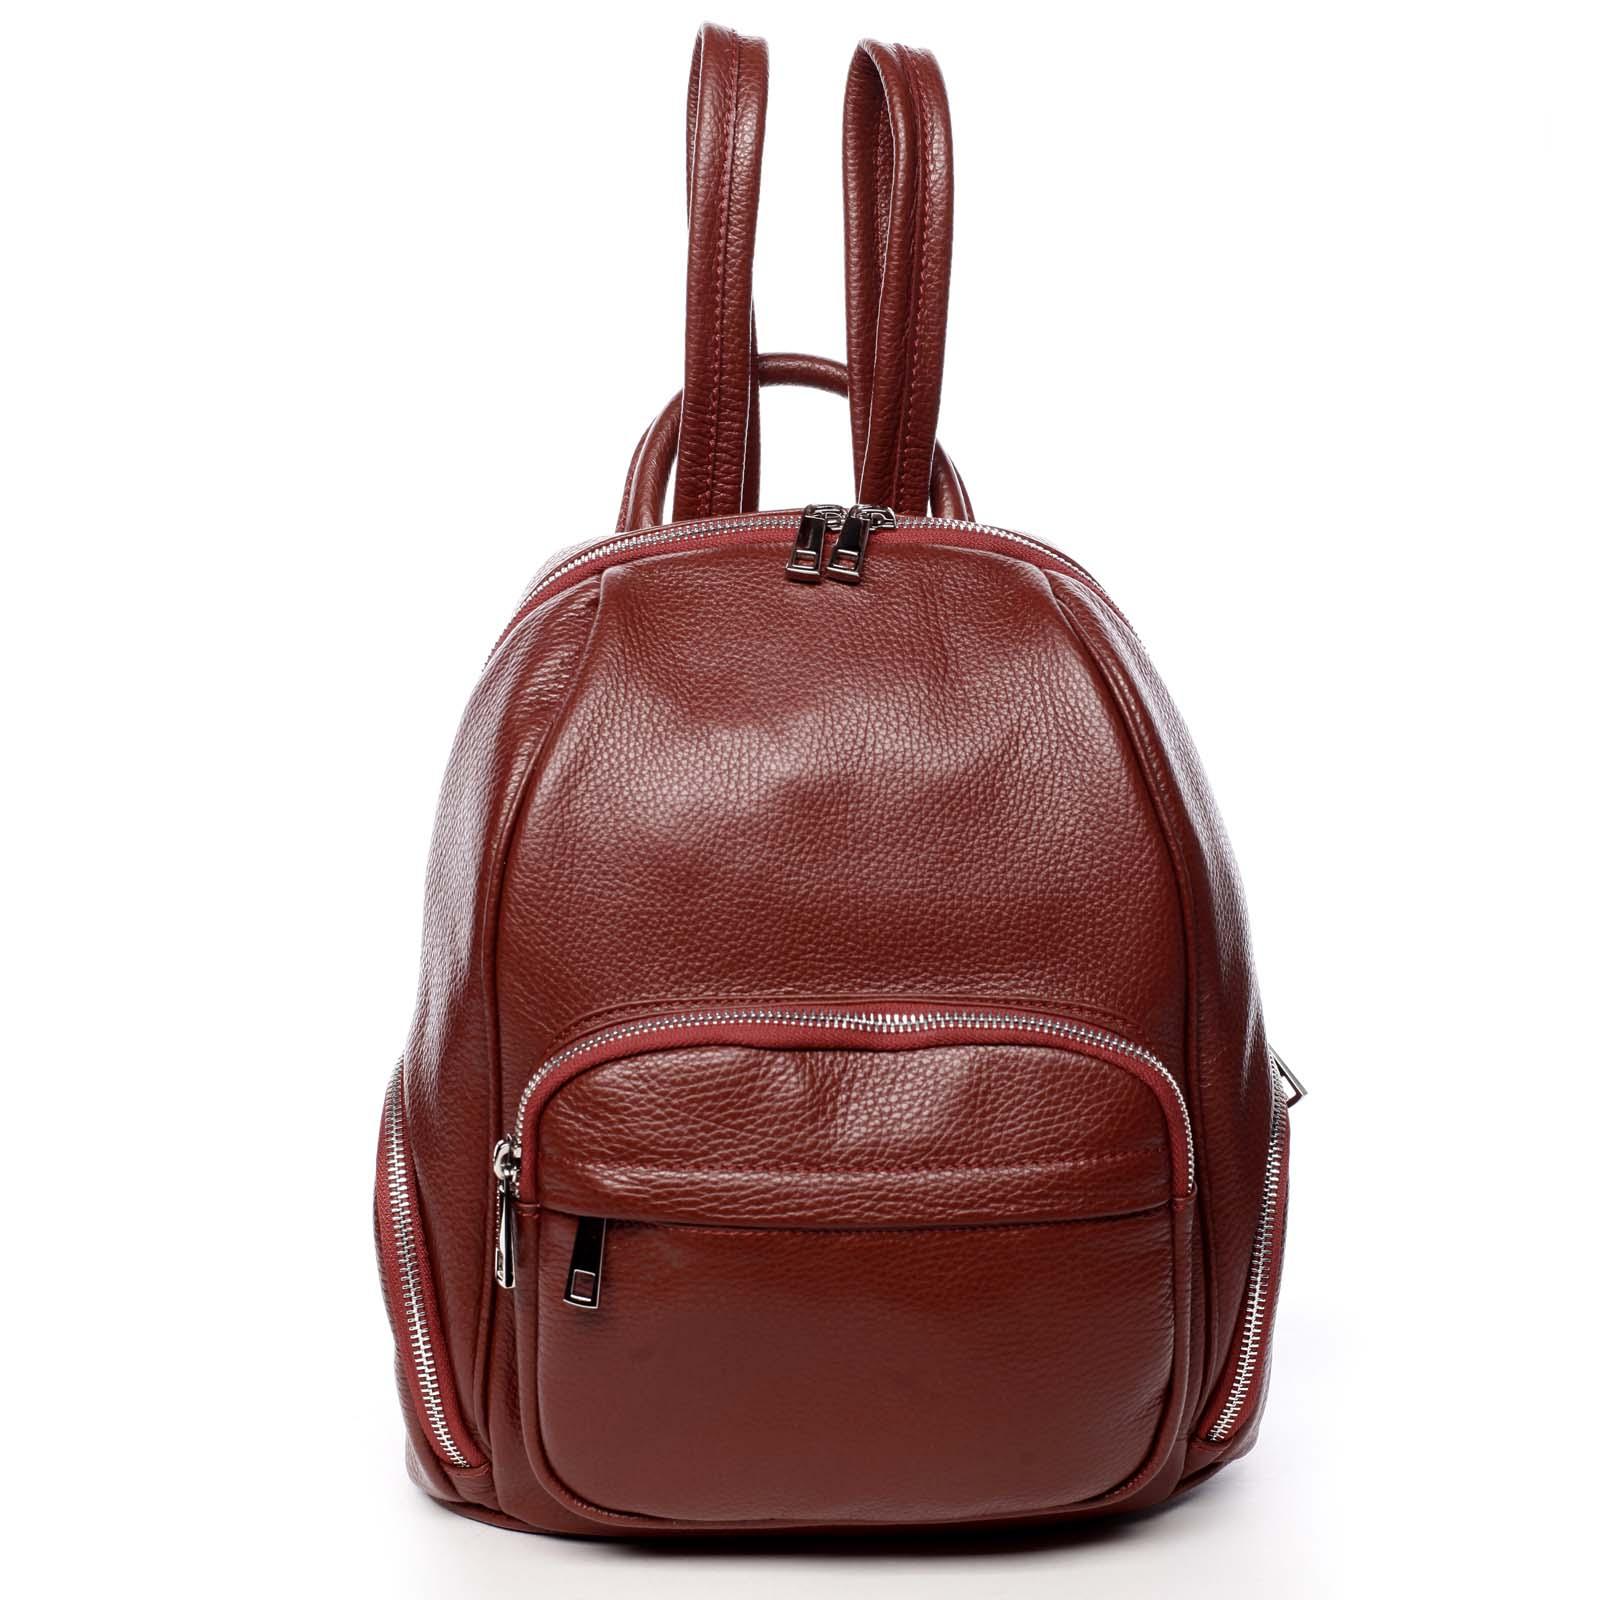 Dámský kožený batoh červený - ItalY Minetta